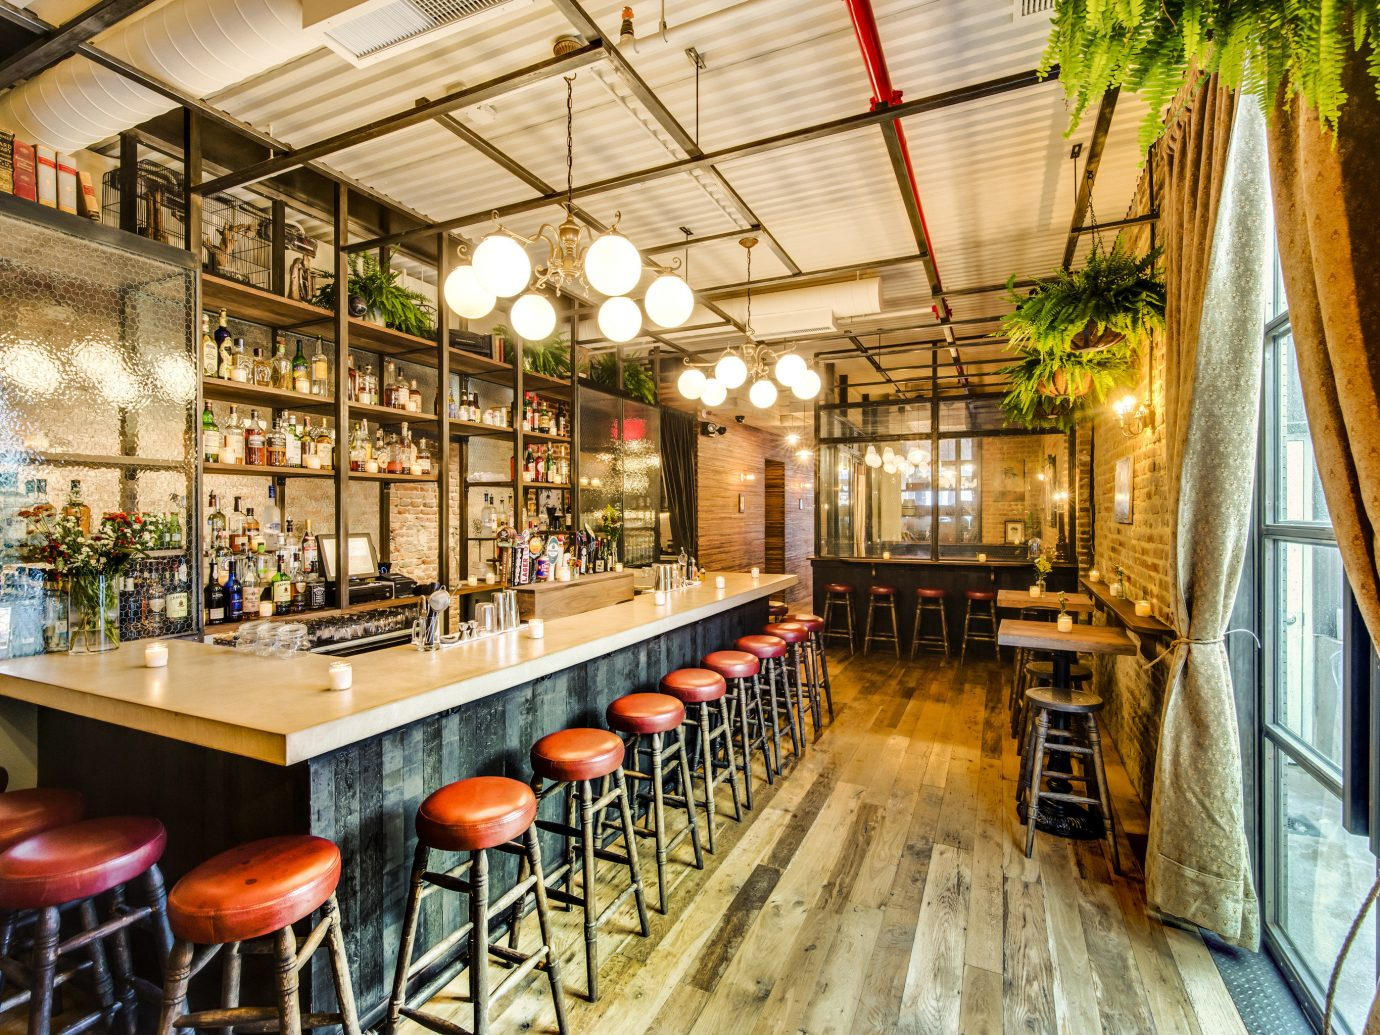 Food + Drink floor indoor restaurant interior design café Bar meal